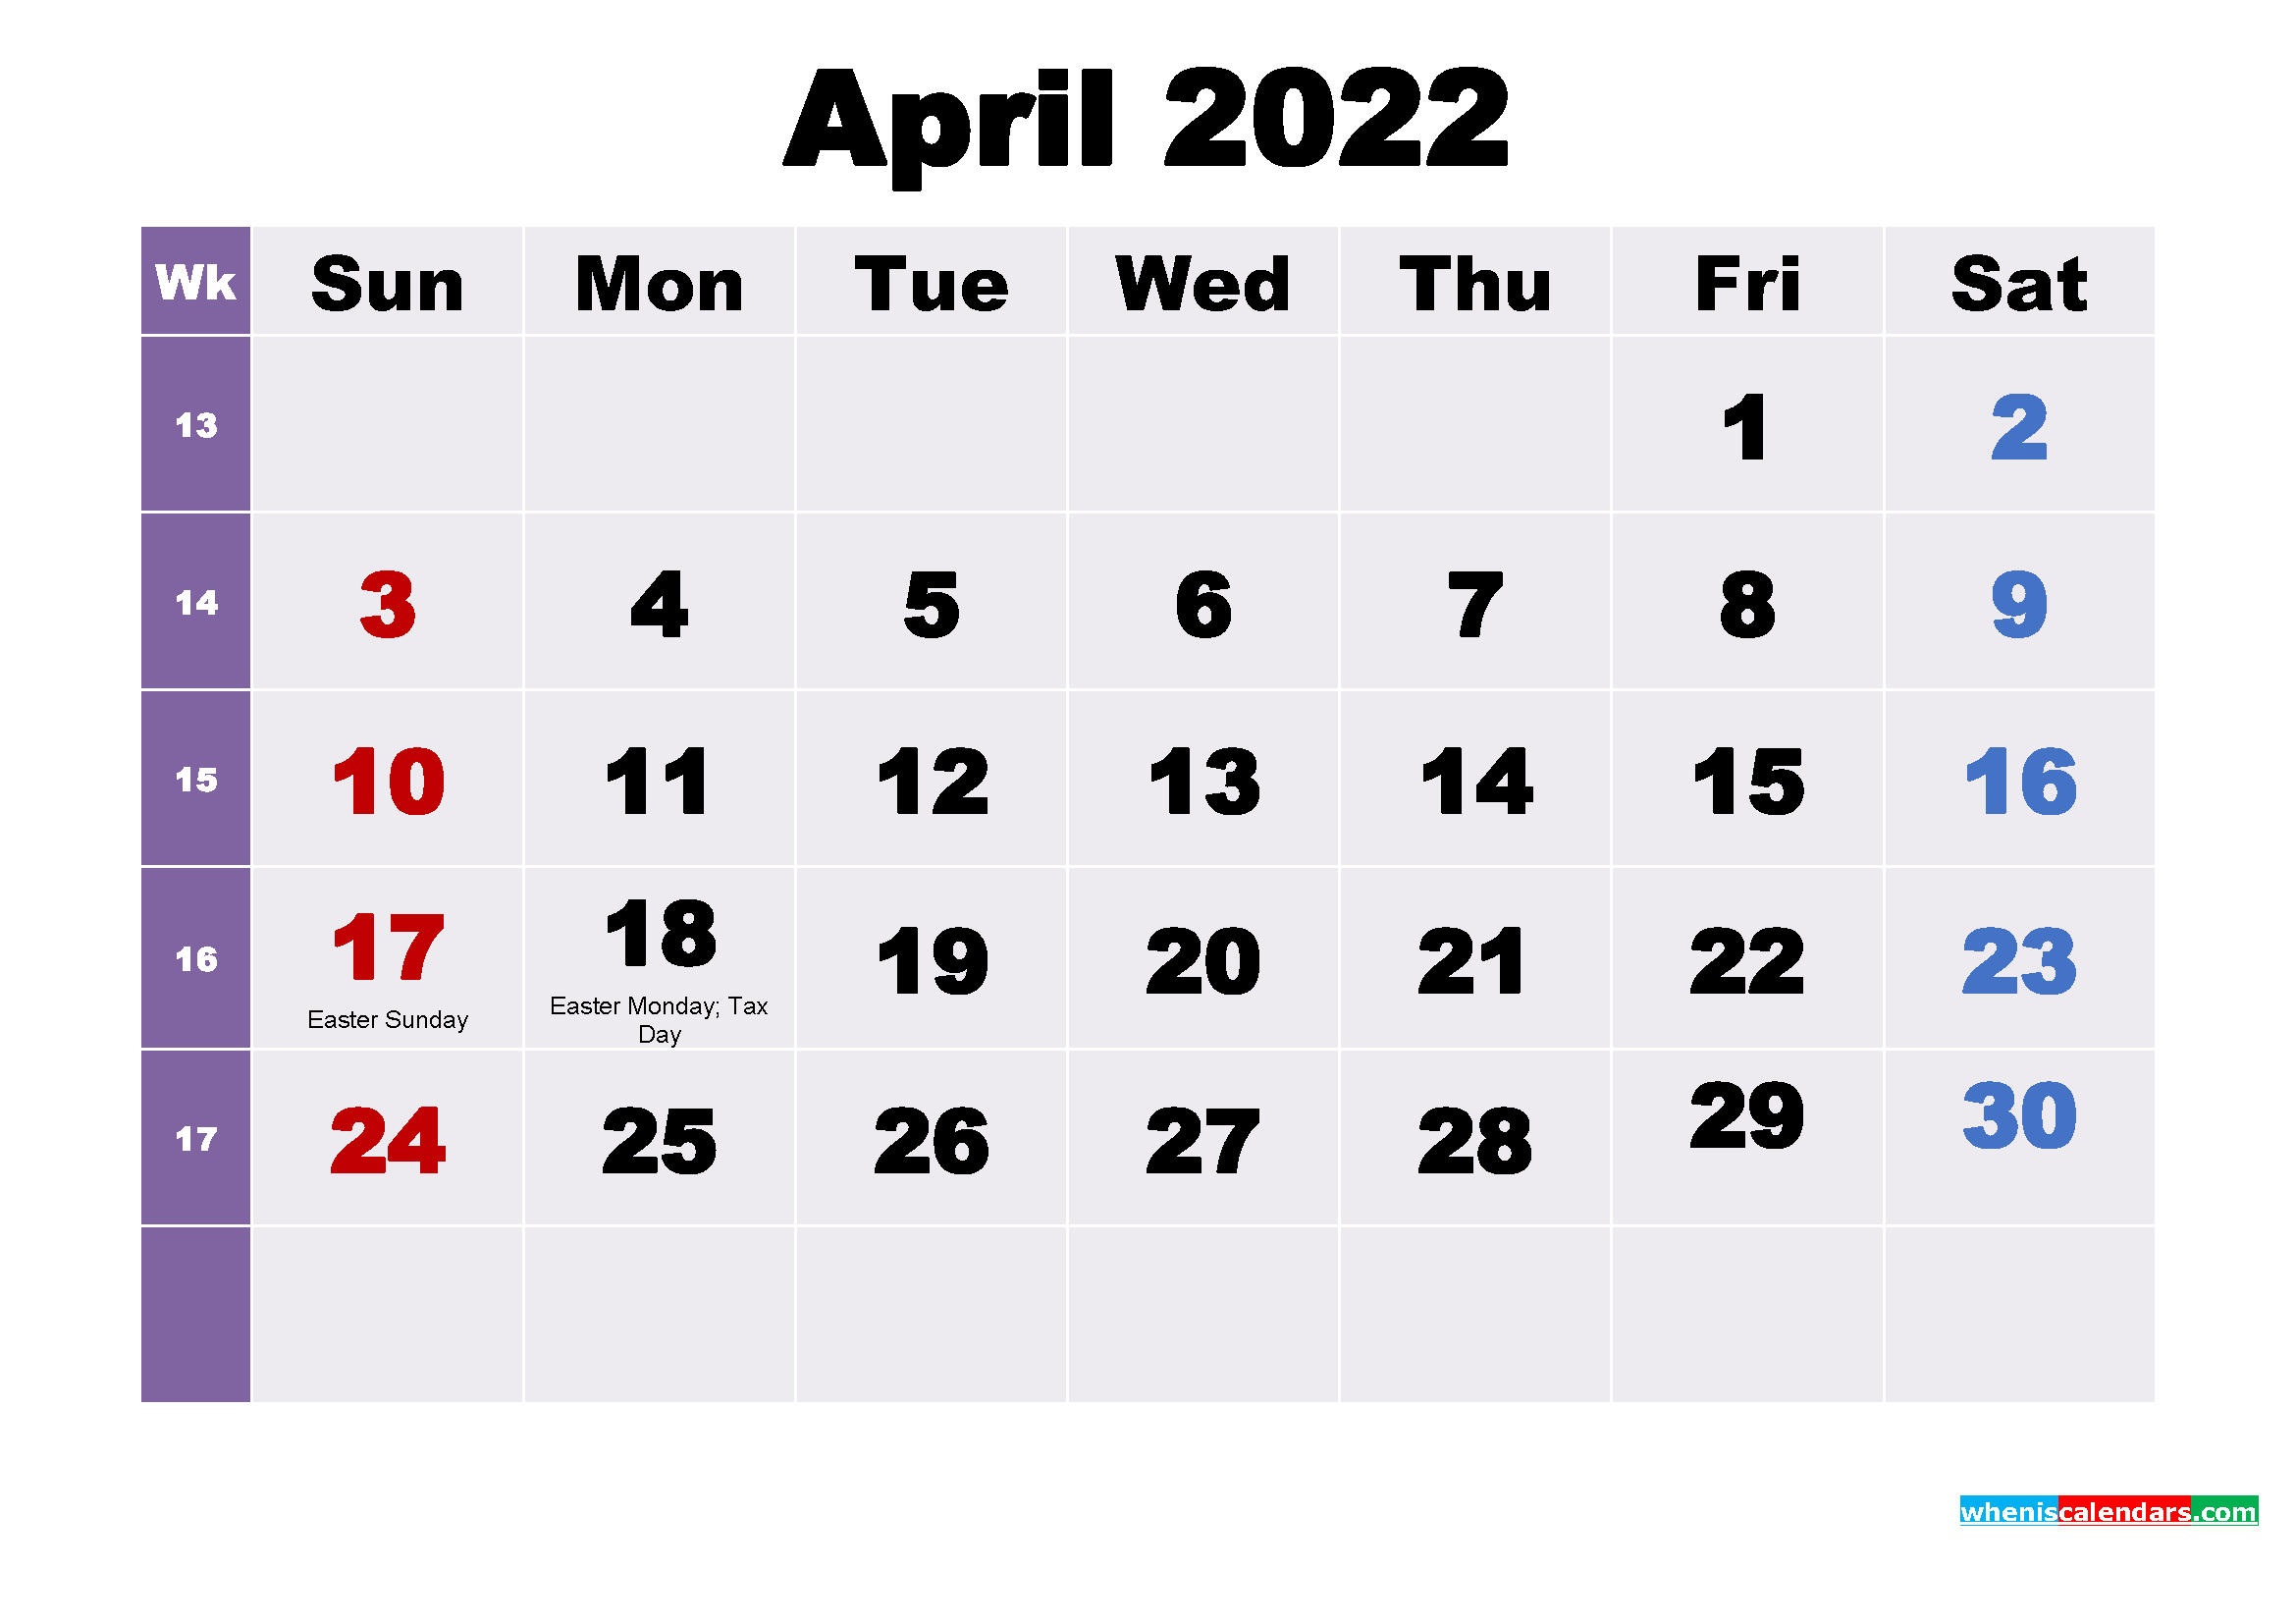 April 2022 Desktop Calendar Free Download